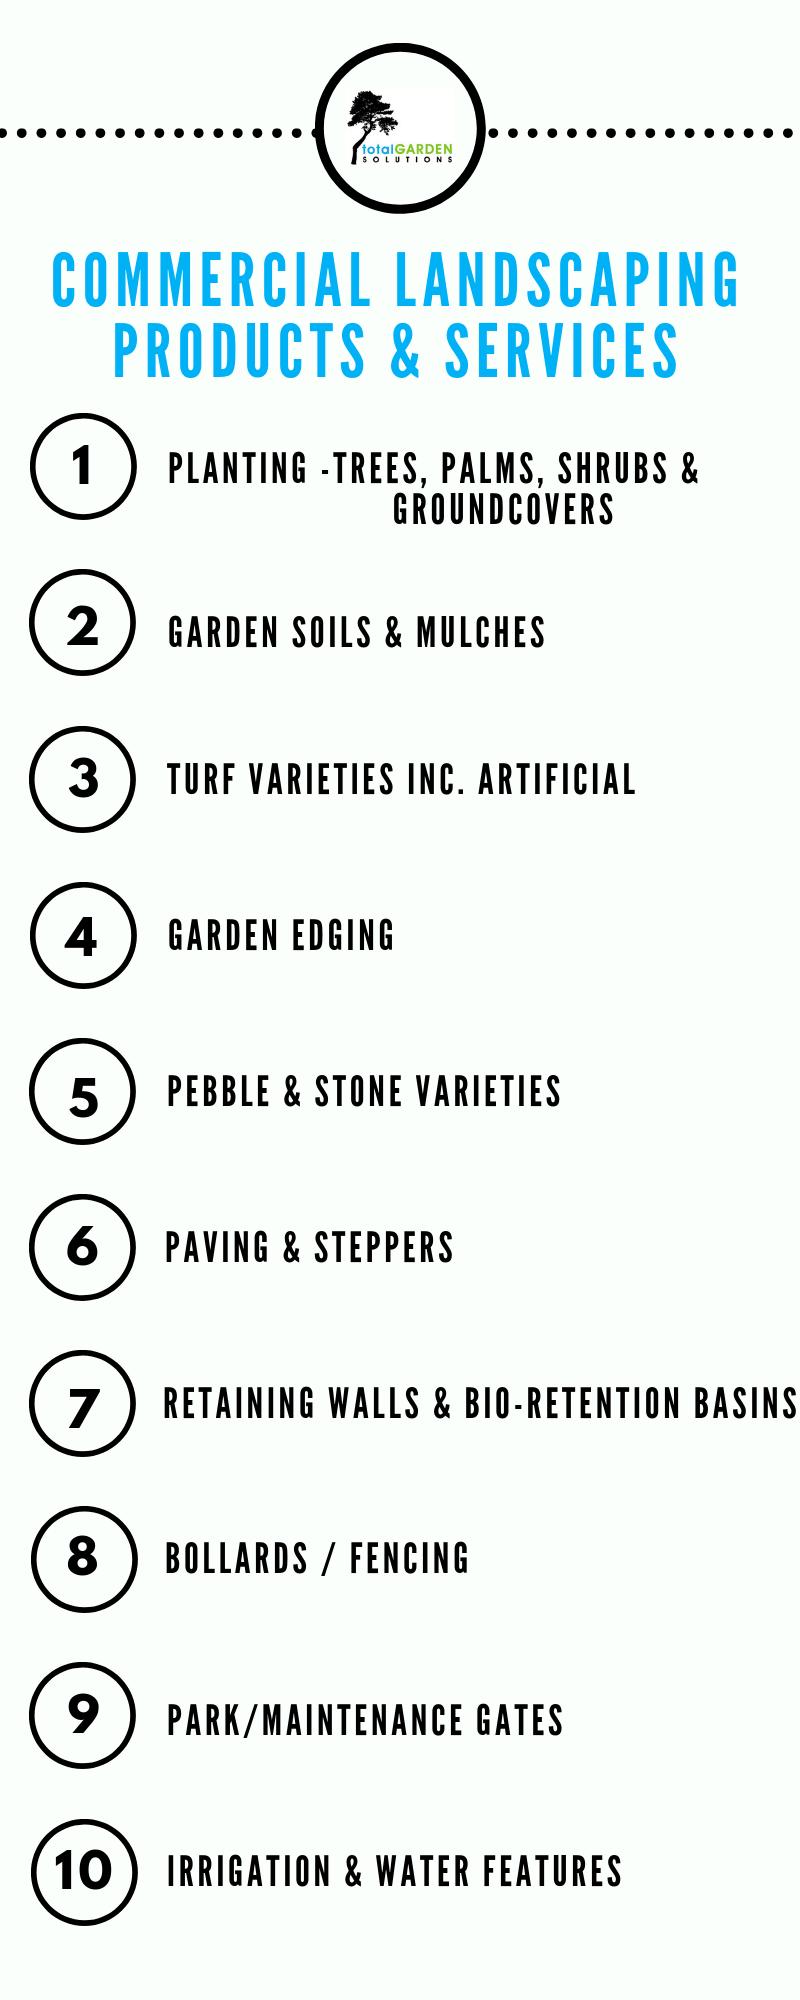 Planting-Trees, Shrubs and Groundcovers, Garden Soils & Mulch, Turf Varieties inc. Artificial, Garden Edge, Pebbles & Stones, Paving & Steppers, Retaining Walls, Bio-Retention Basins, Bollards, Fencing, Park & Maintenance Gates, Irrigation & Water Features